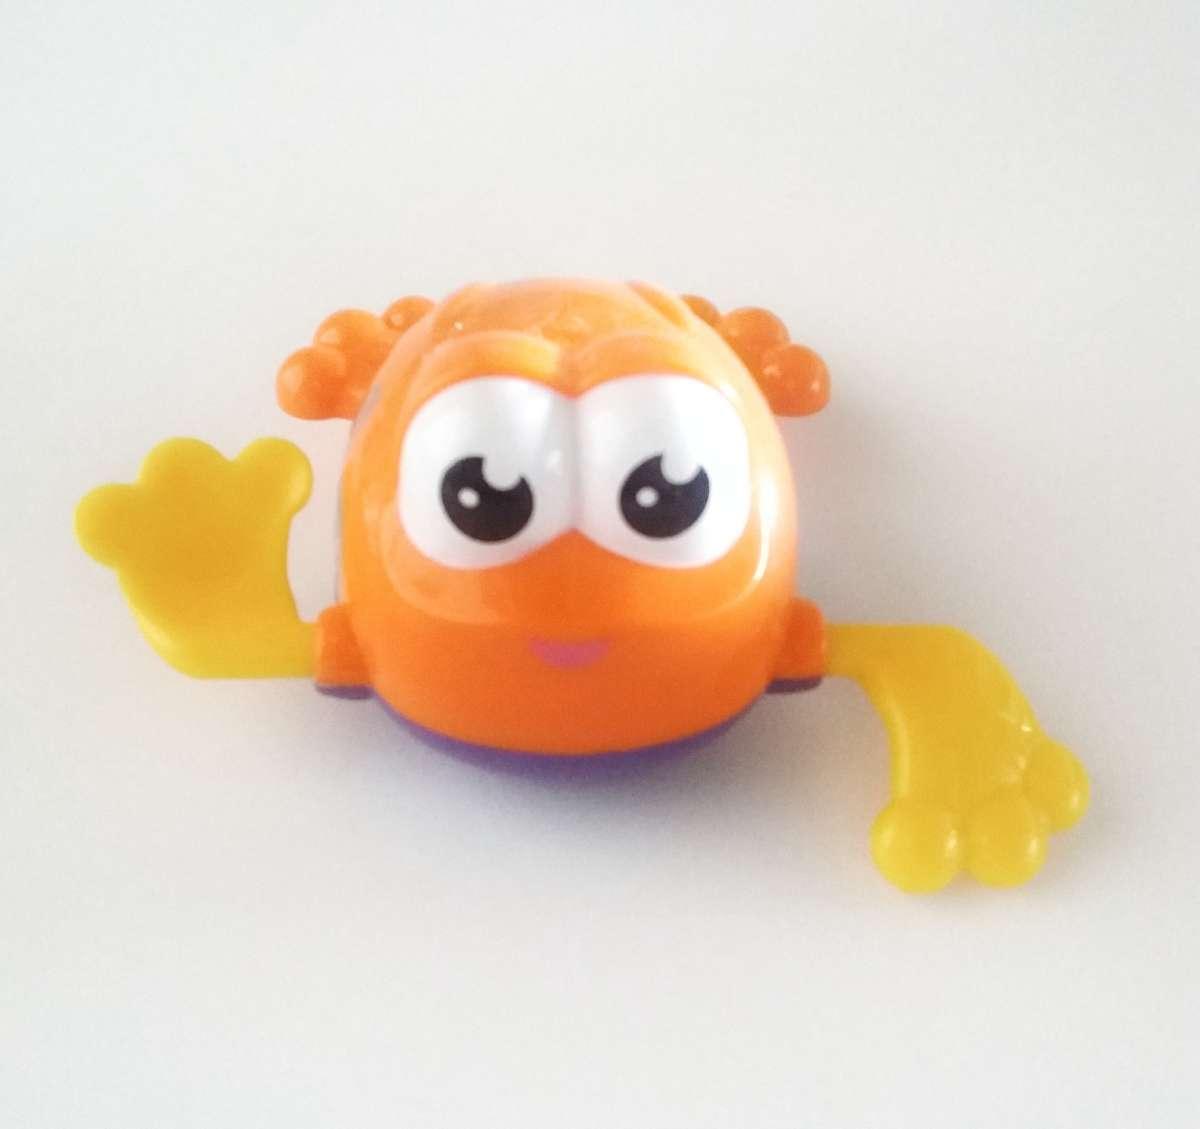 BebeBee mehāniski uzvelkamā rotaļlieta Vardīte